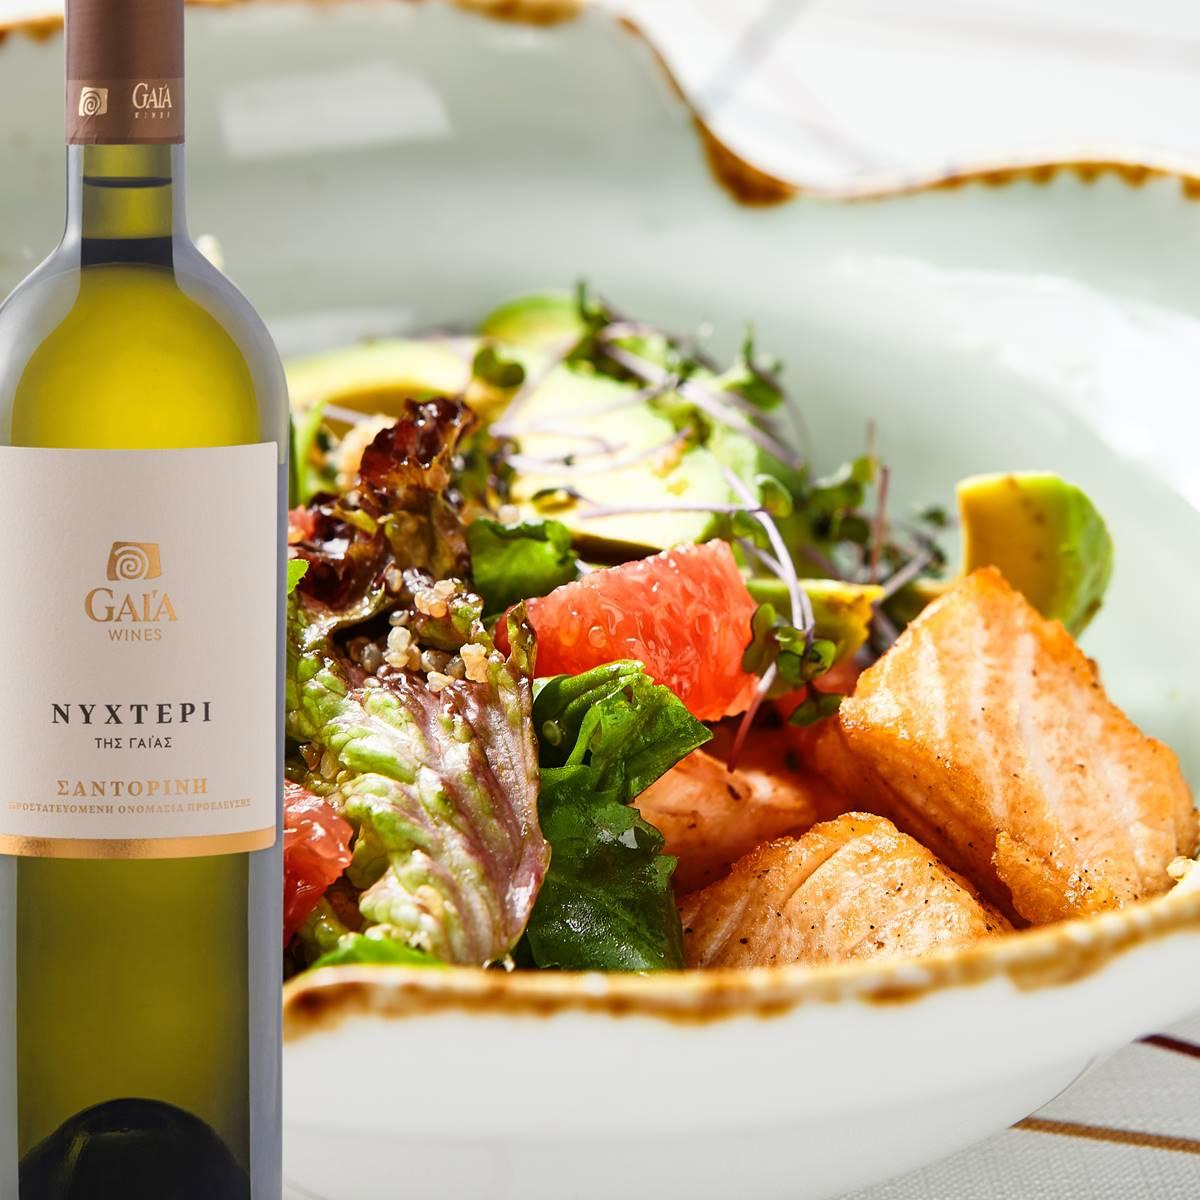 Wine Pairing ΝΥΧΤΕΡΙ ΤΗΣ ΓΑΙΑΣ, Λευκό - Gaia Wines